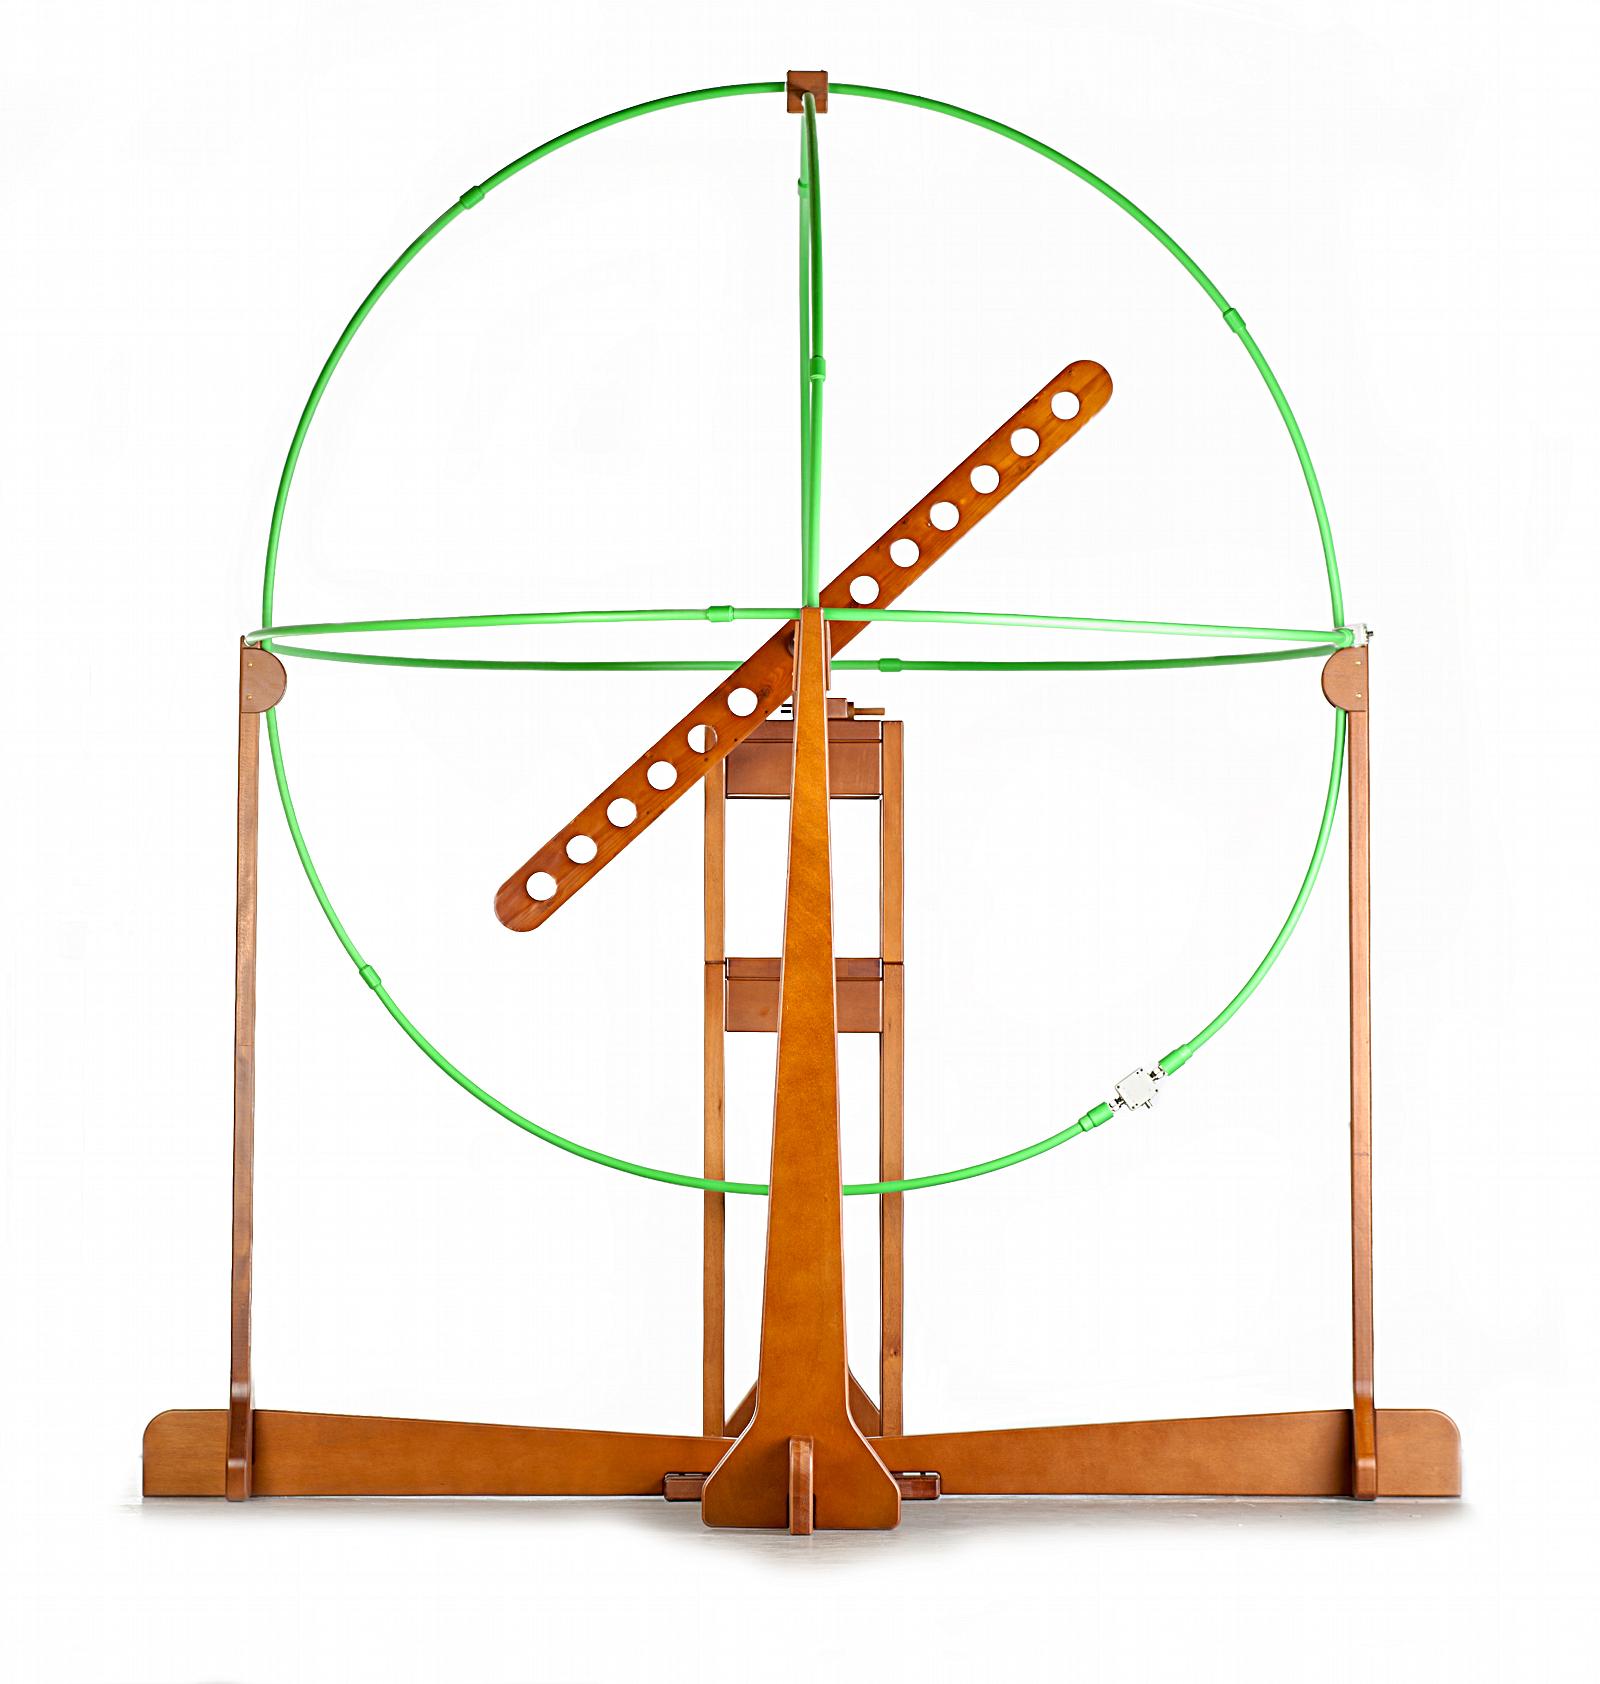 AFJ Instruments - Van Veen Loop-Antenne - Leitungsgebundene